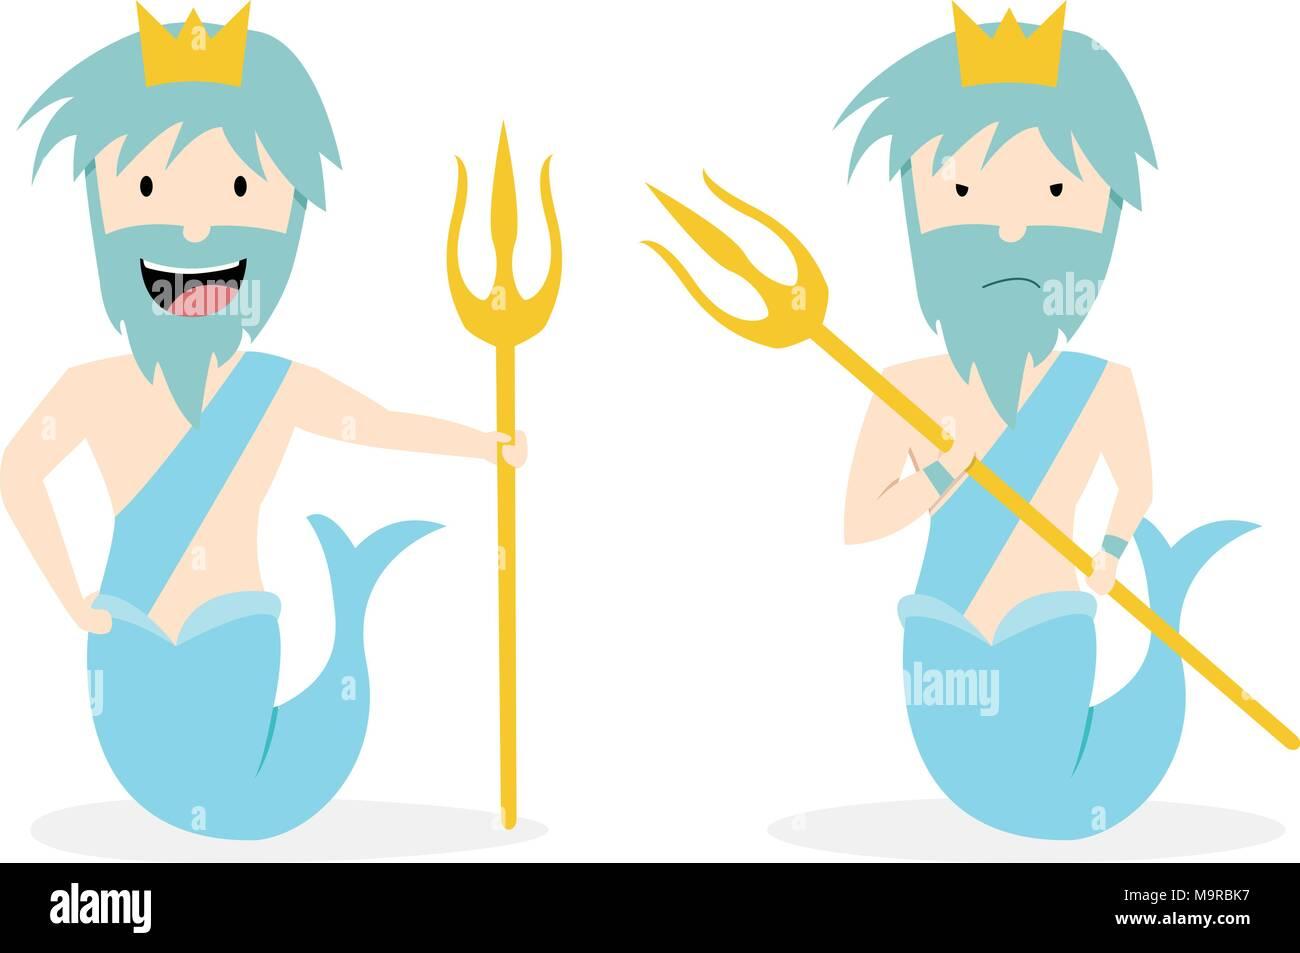 Poseidon god sea god stock photos poseidon god sea god stock poseidon god of the sea in flat vector art design stock image biocorpaavc Image collections